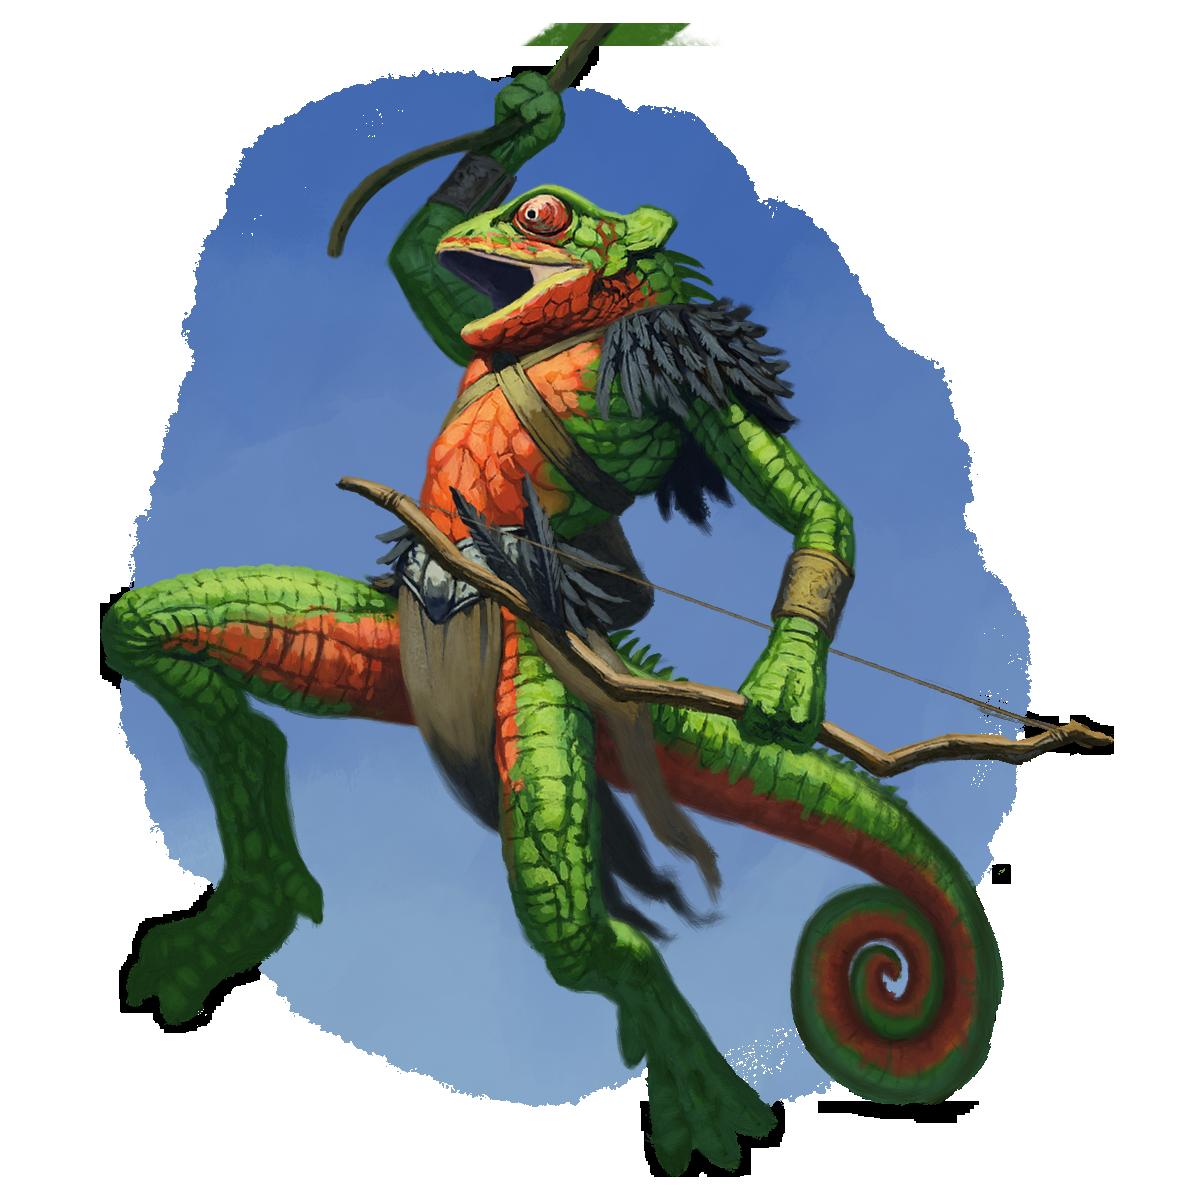 DeanSpencer-spotcol-humanoidchameleon.png